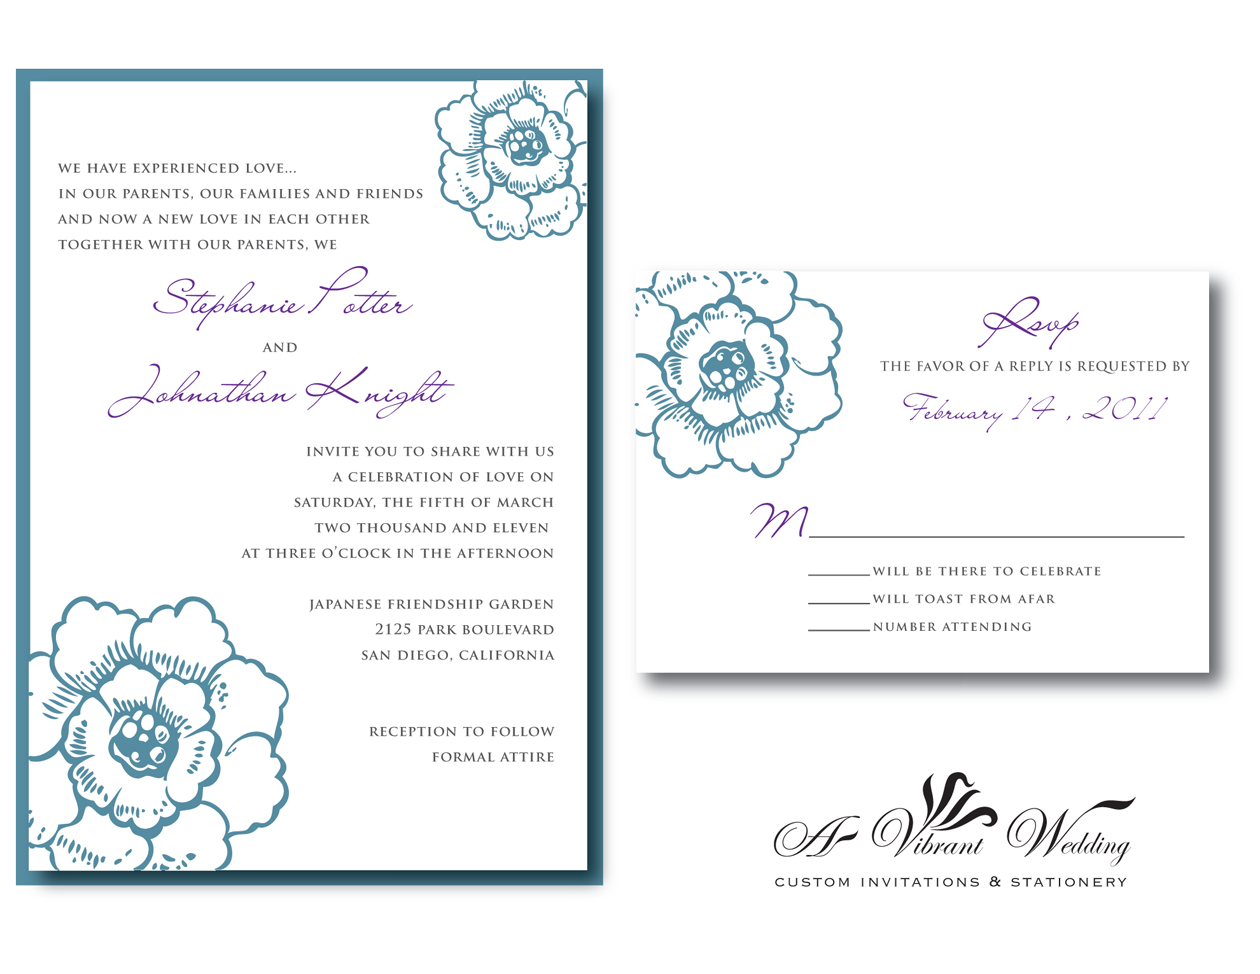 Purple And Blue Wedding Invitations: A Vibrant Wedding Invitations